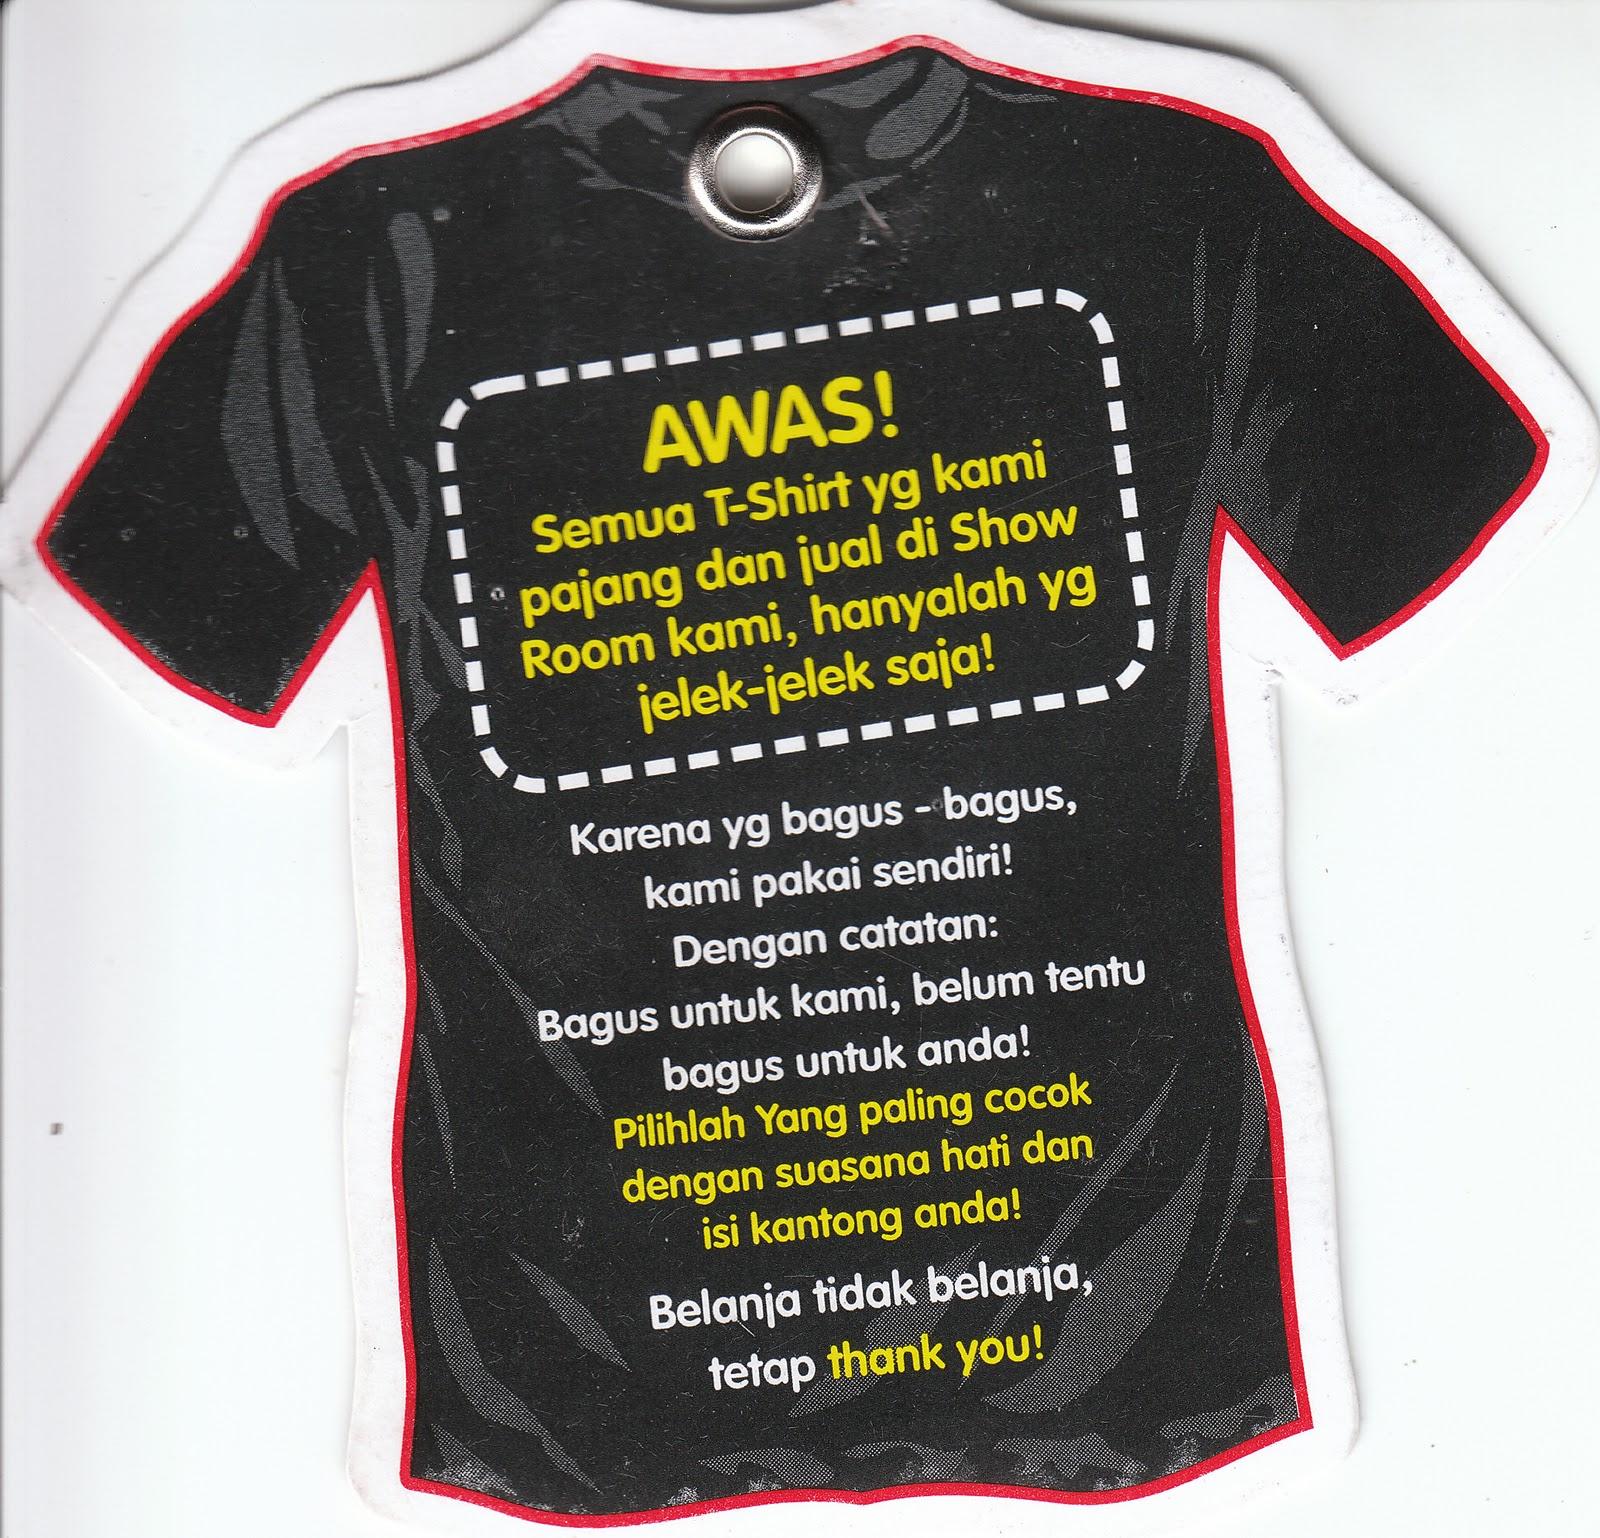 Hikari Kaos Kaos Unik Made In Indonesia